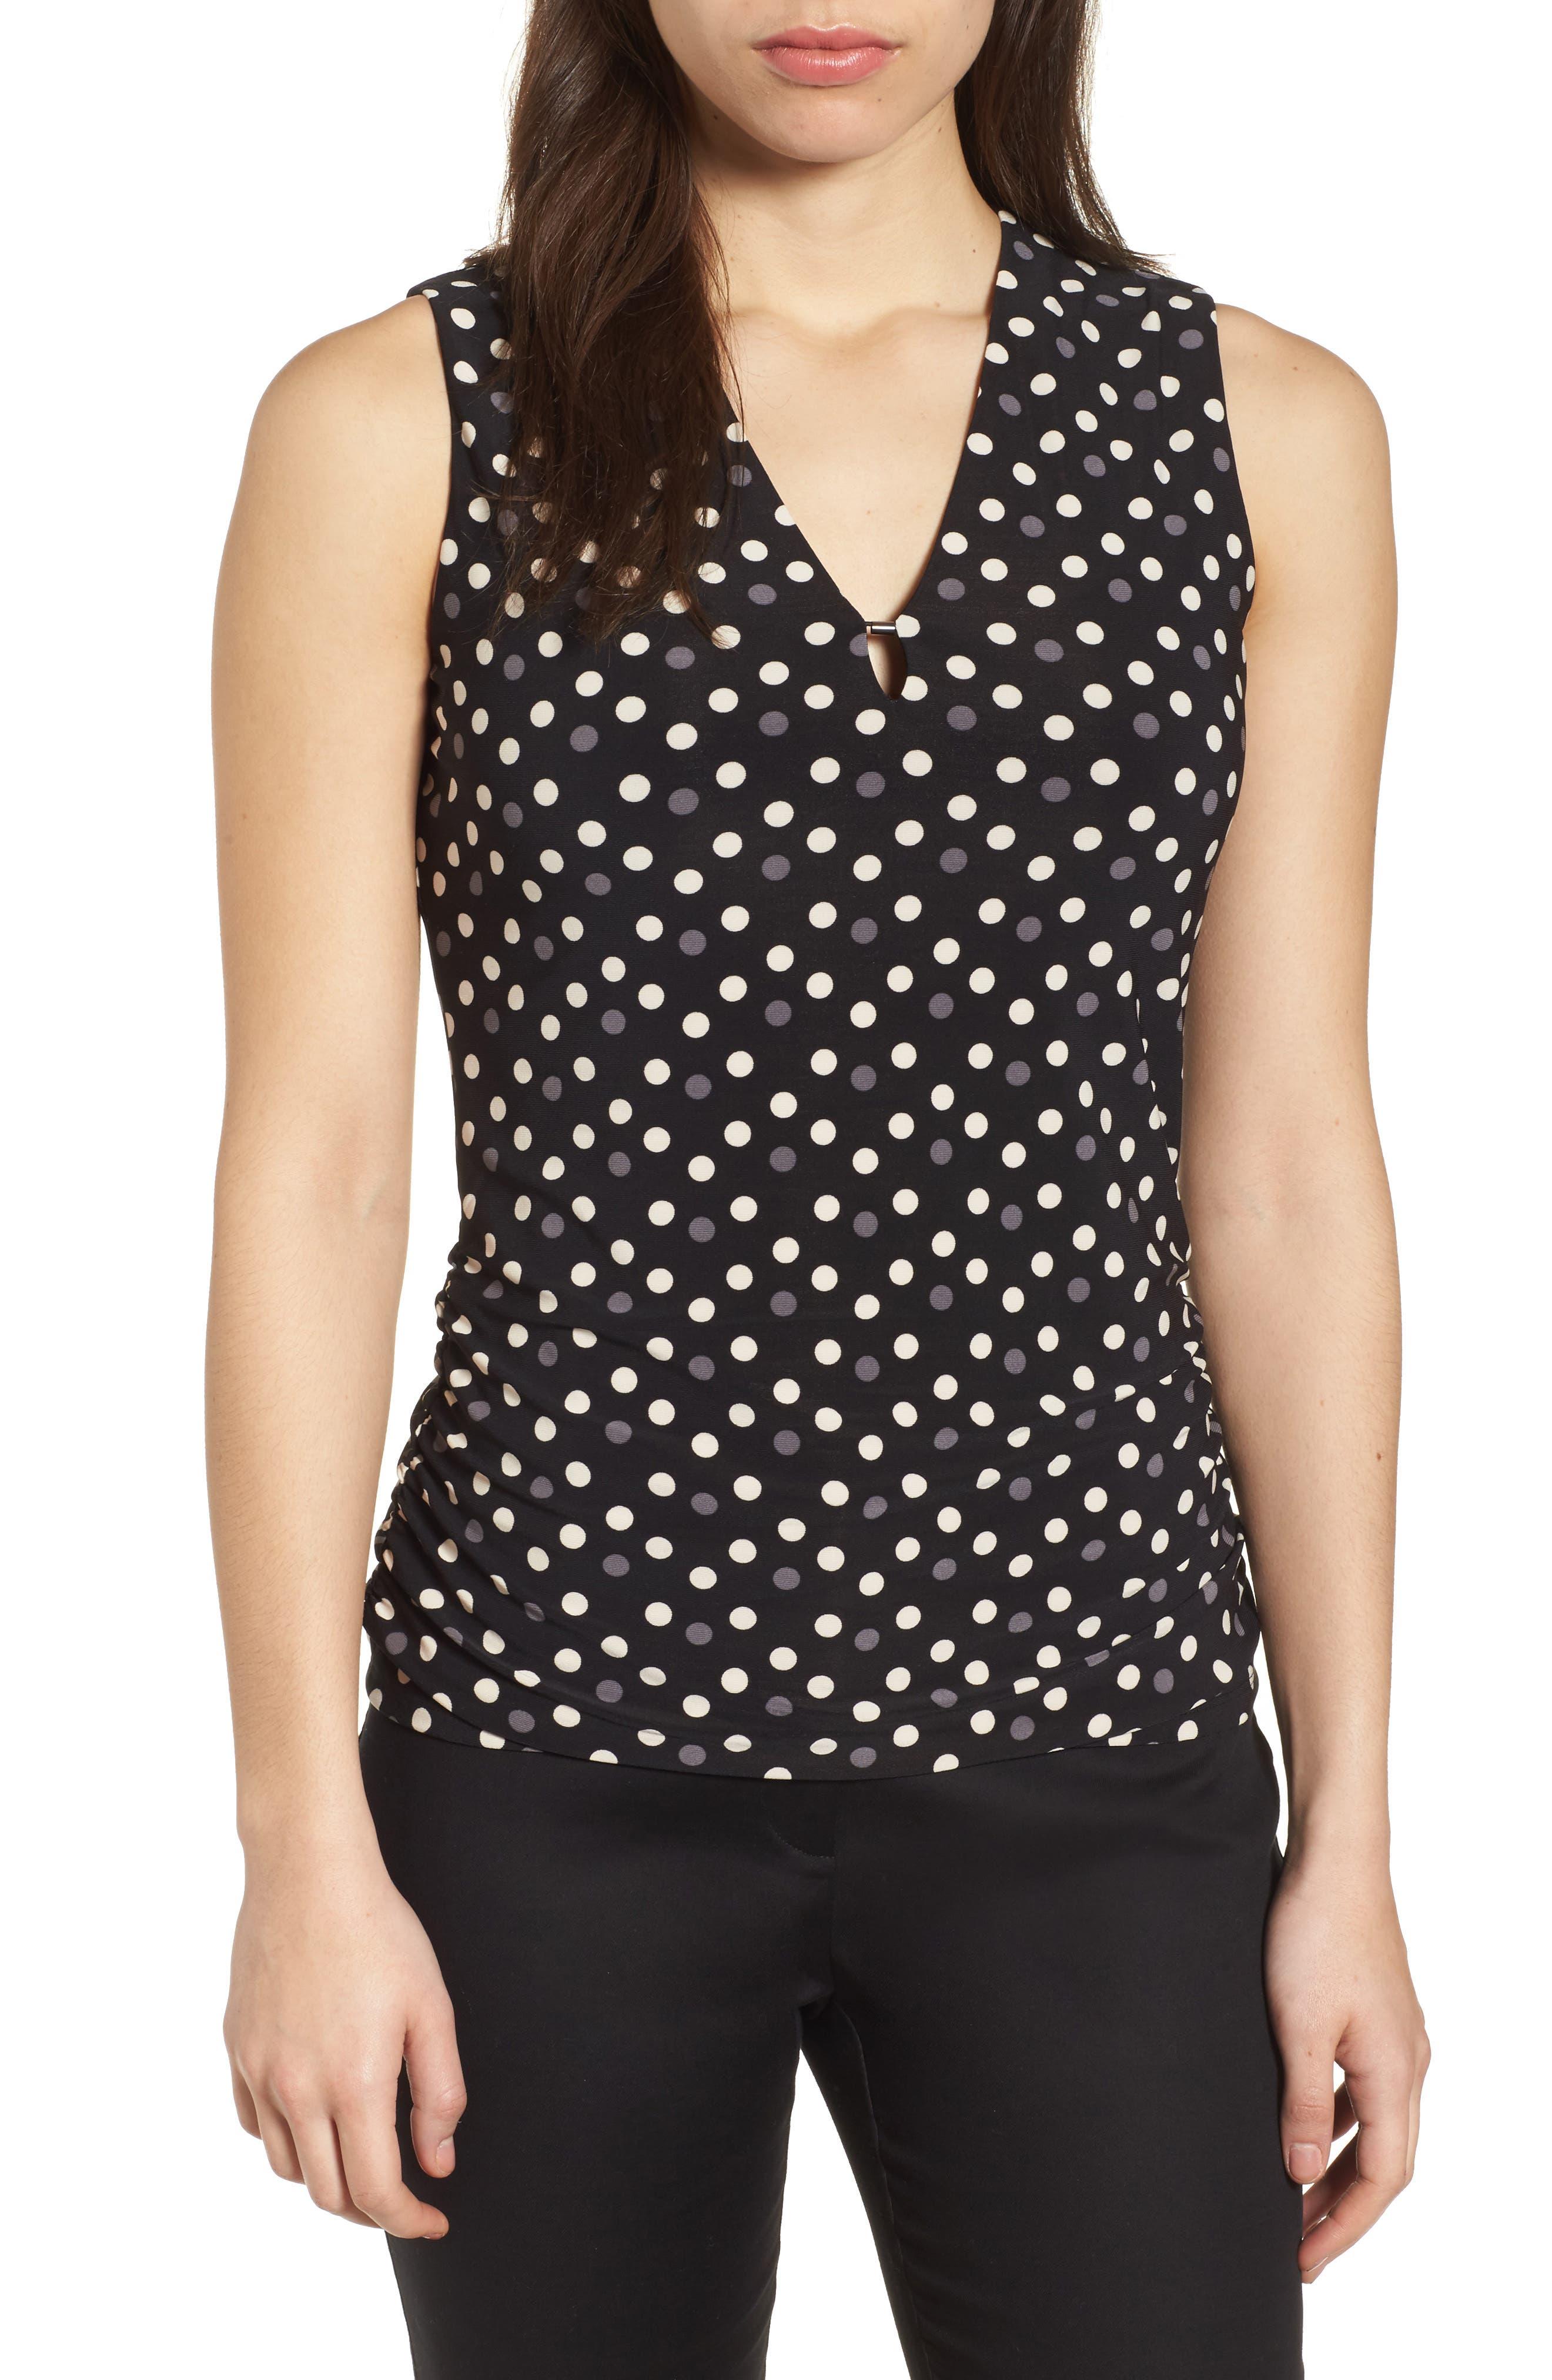 Alternate Image 1 Selected - Anne Klein Splashy Dot Matte Jersey Top